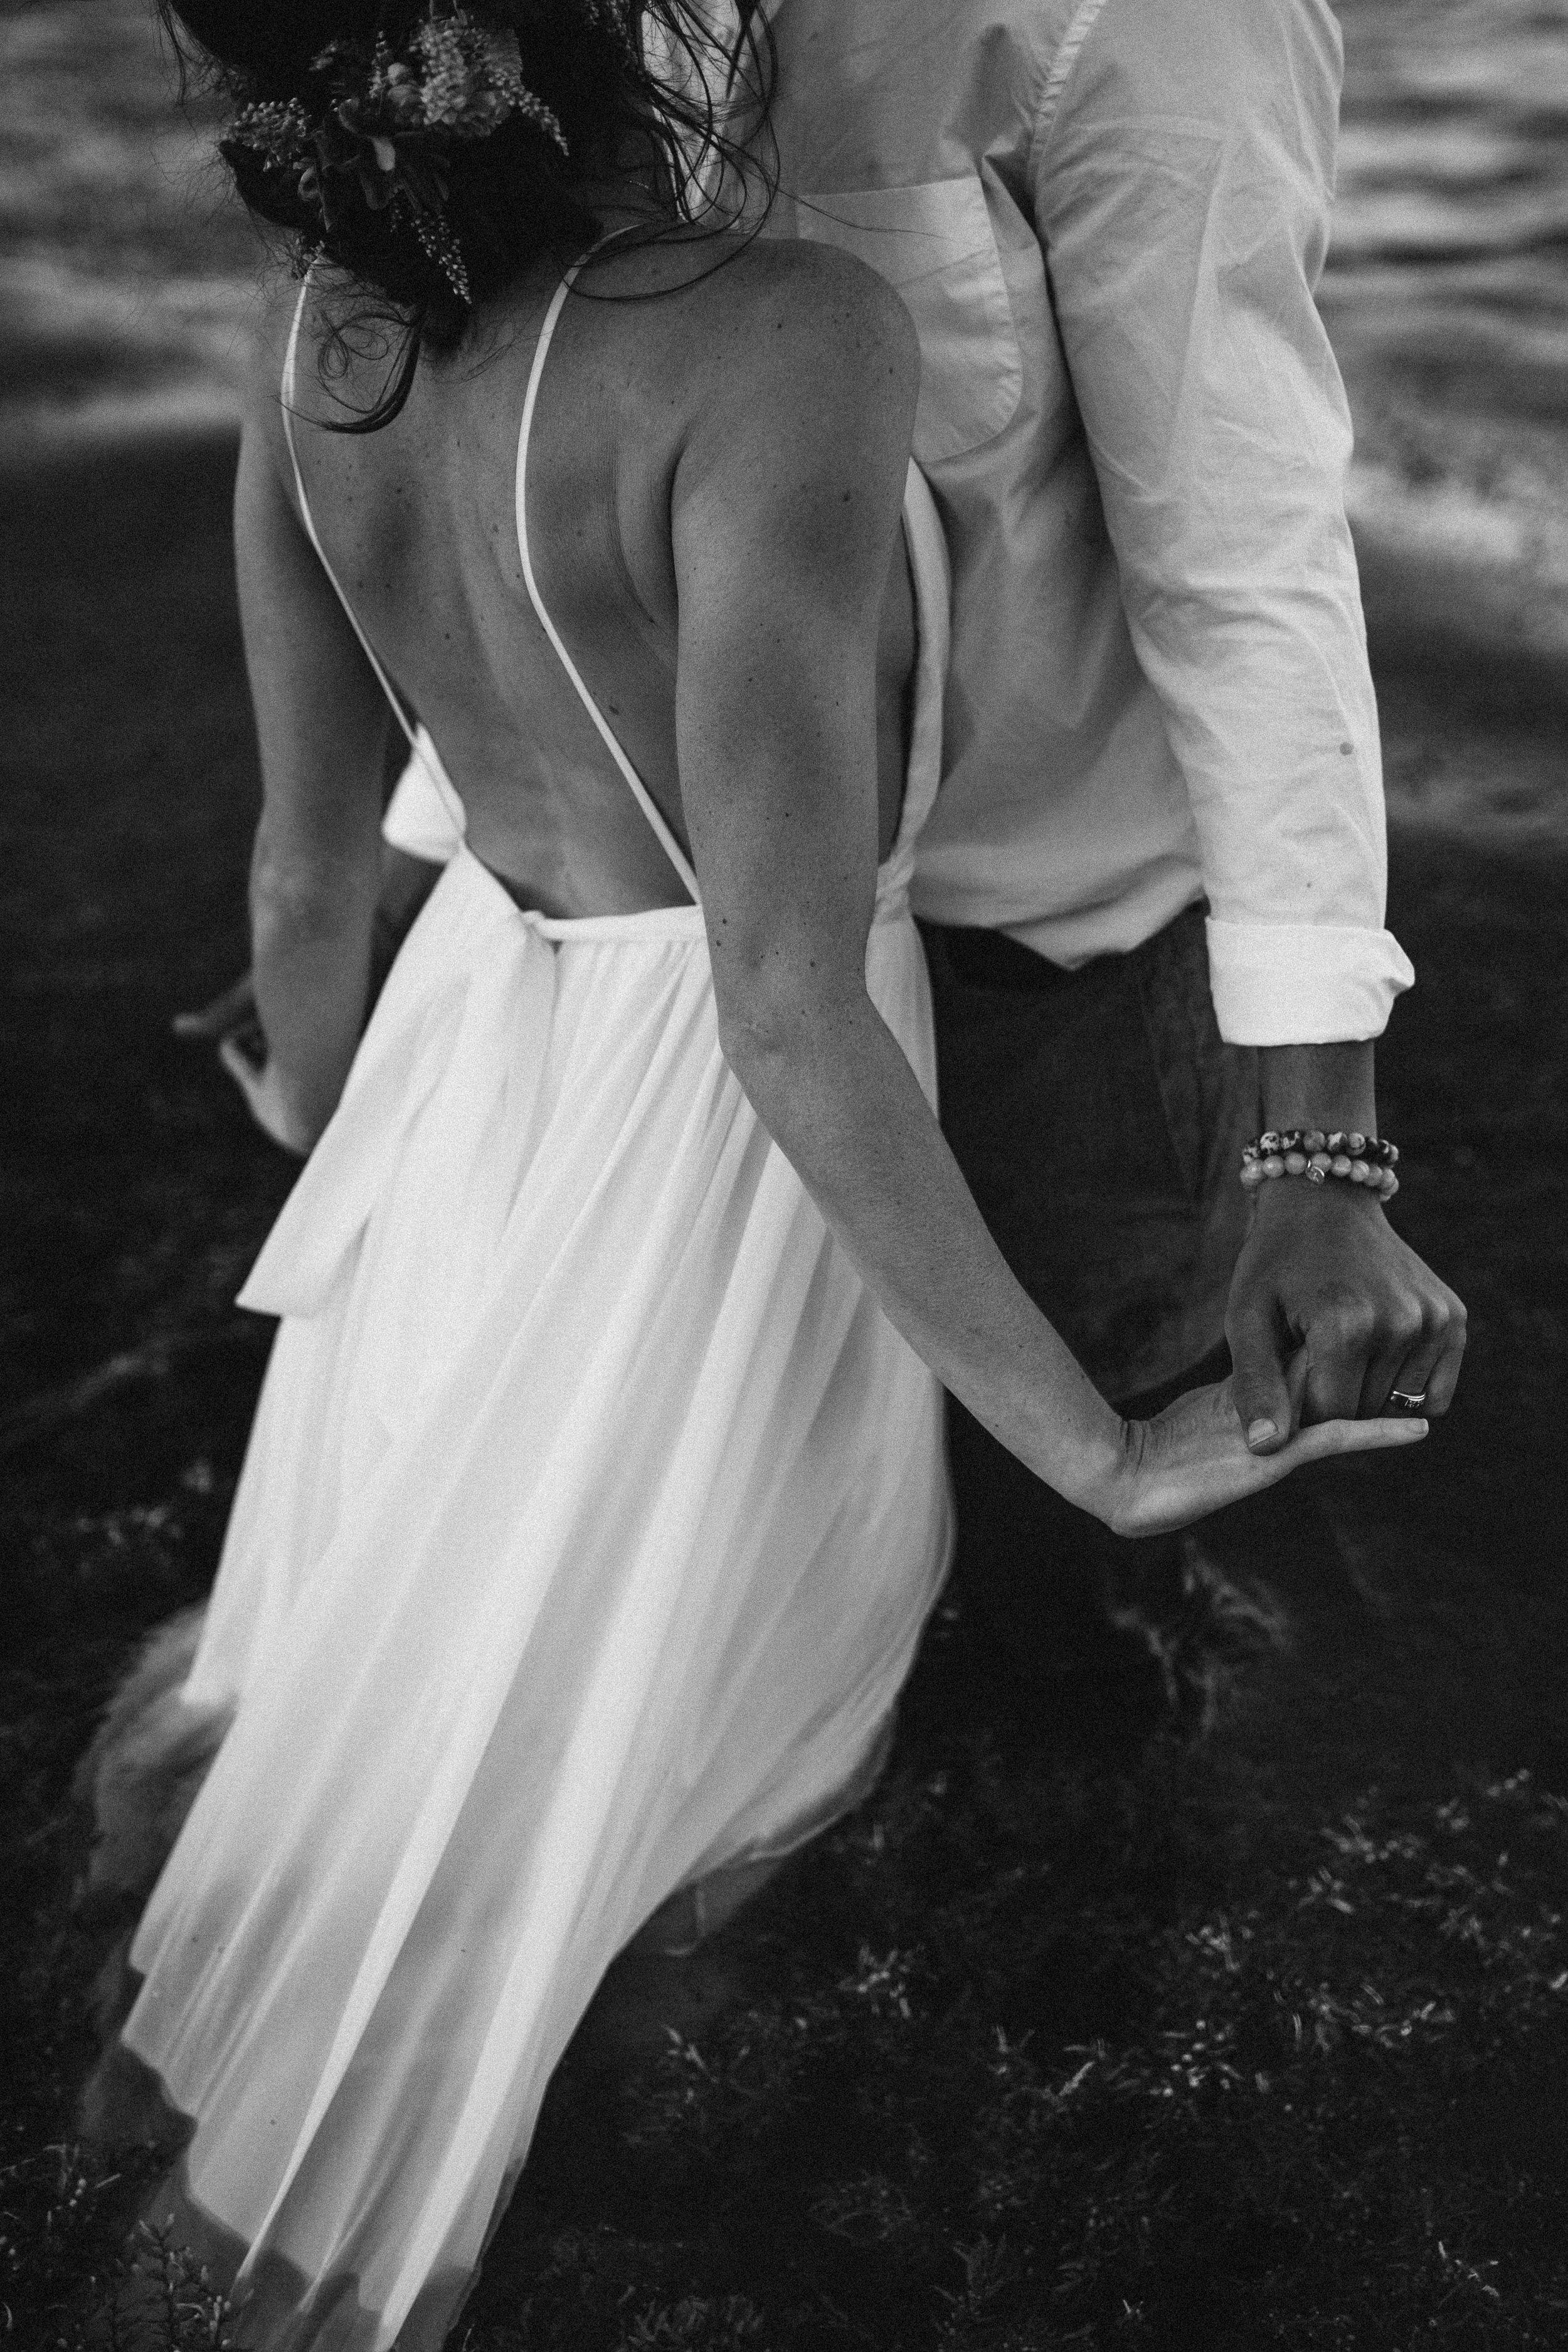 Nicole-Daacke-Photography-beachfront-akumal-destionation-wedding-tulum-mexico-elopement-photographer-destination-wedding-inspiration-sunset-champagne-pop-boho-bride-ocean-tropical-bohemian-tulum-wedding-photos-204.jpg